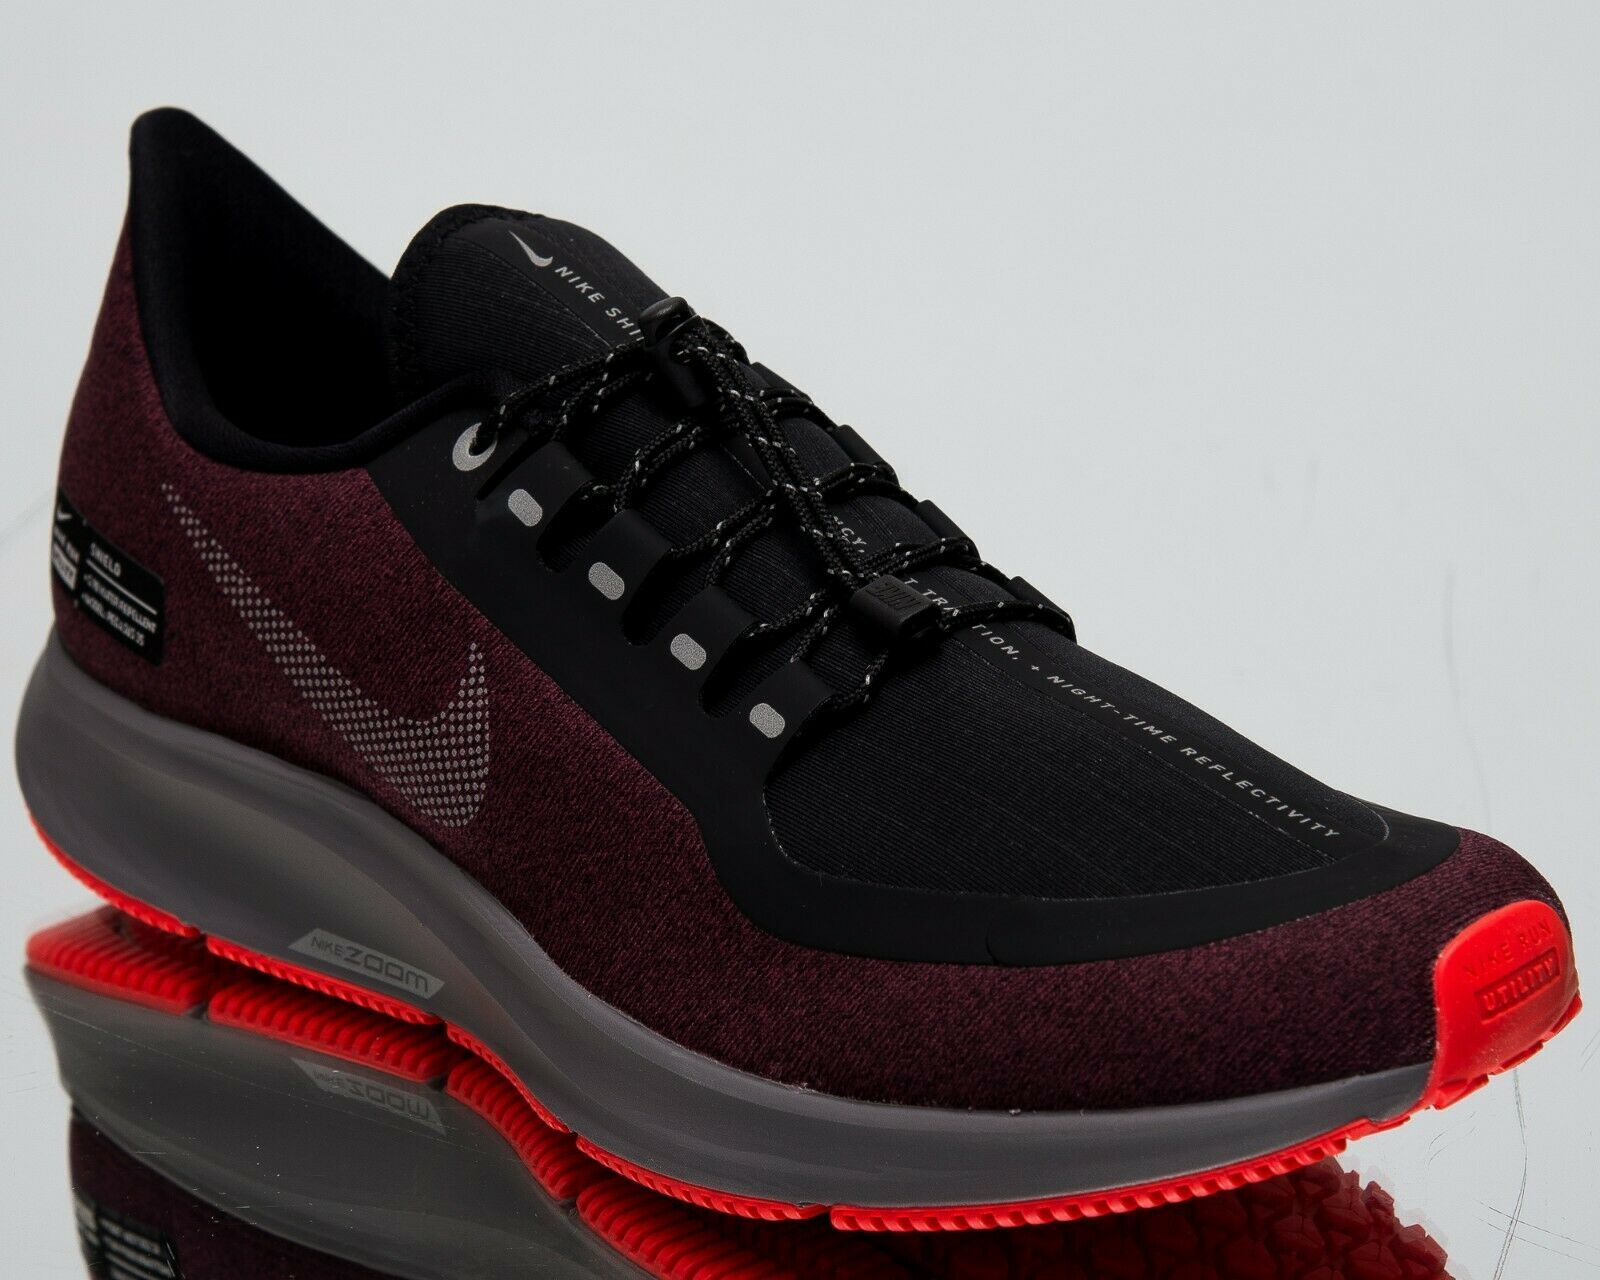 Nike Air Zoom Pegasus 35 Shield New Men S Running Shoes Black Silver Aa1643 004 Nike Nikeair Best Running Shoes Running Shoes For Men Black Running Shoes